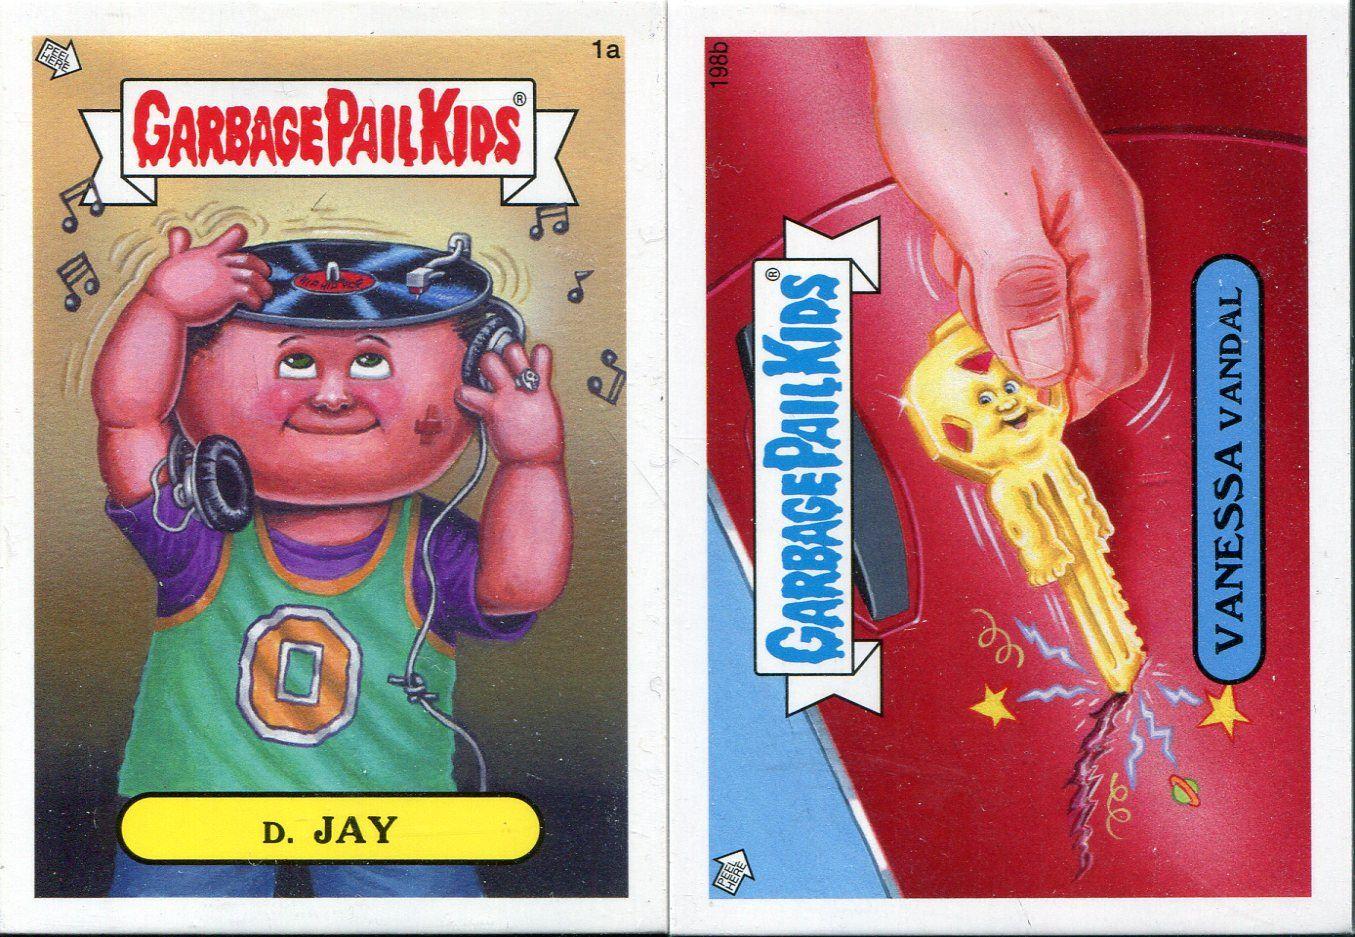 JAY Garbage Pail Kids Mini Cards 2013 Base Card 1a D